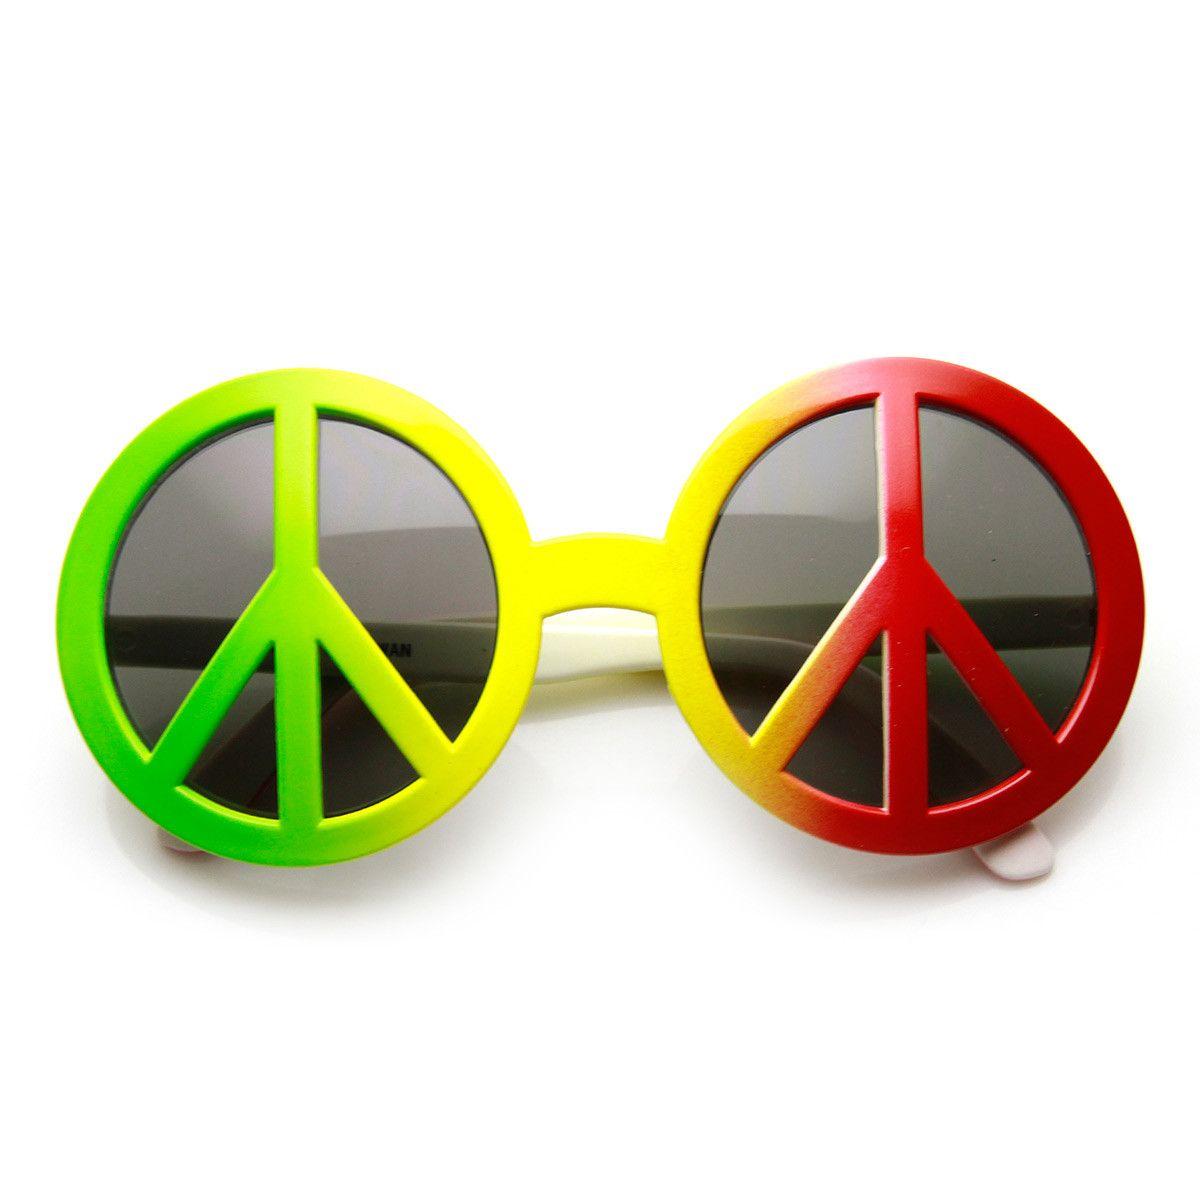 Hippie clipart hippie glass. Peace sign s era